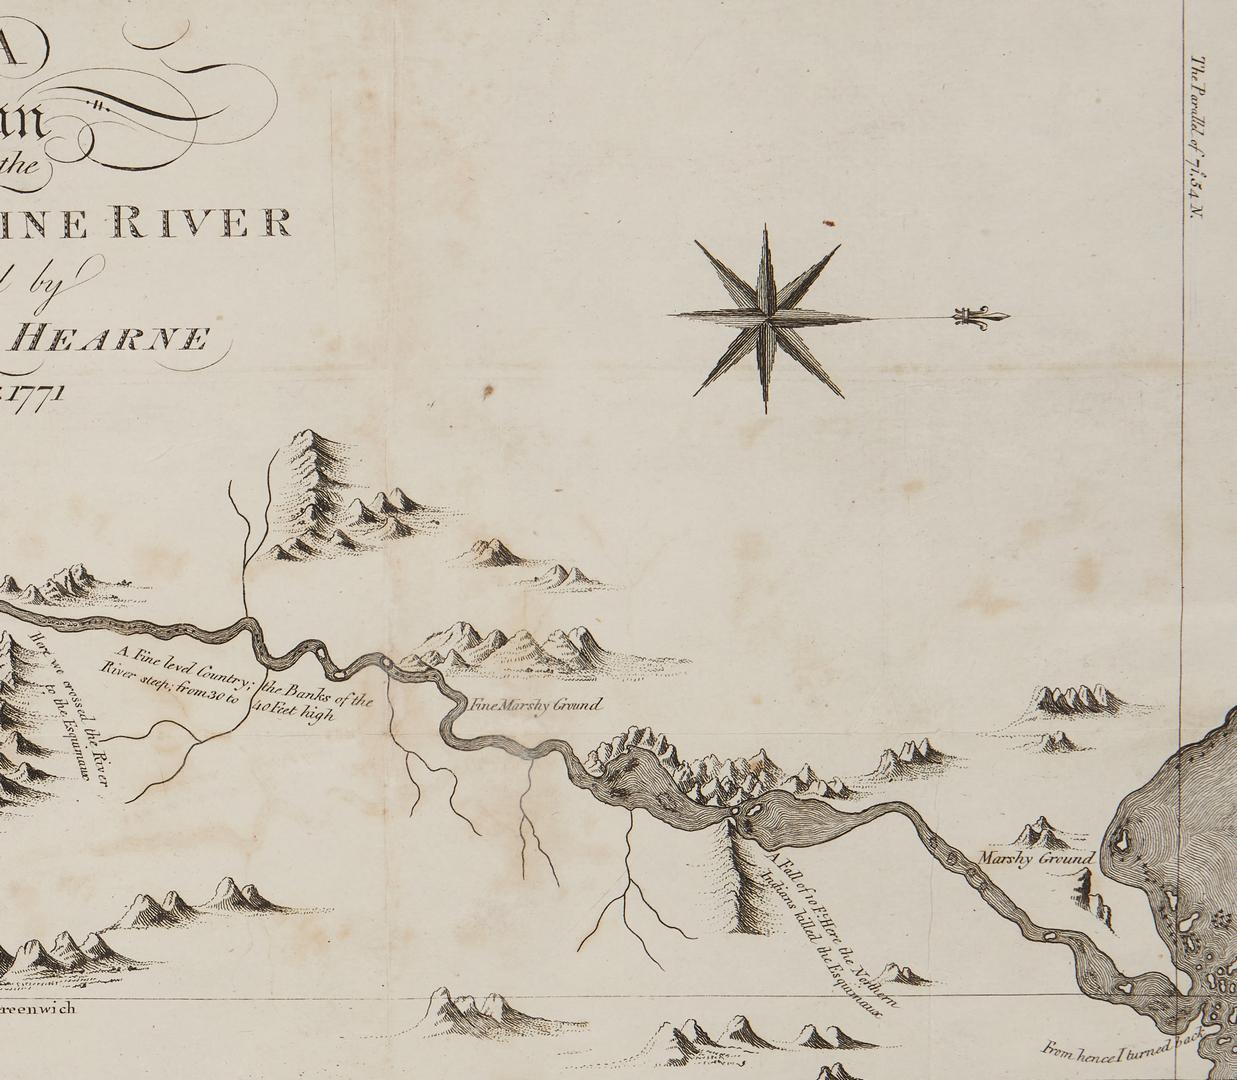 Lot 1072: Samuel Hearne Map of Copper Mine River plus View of Boston